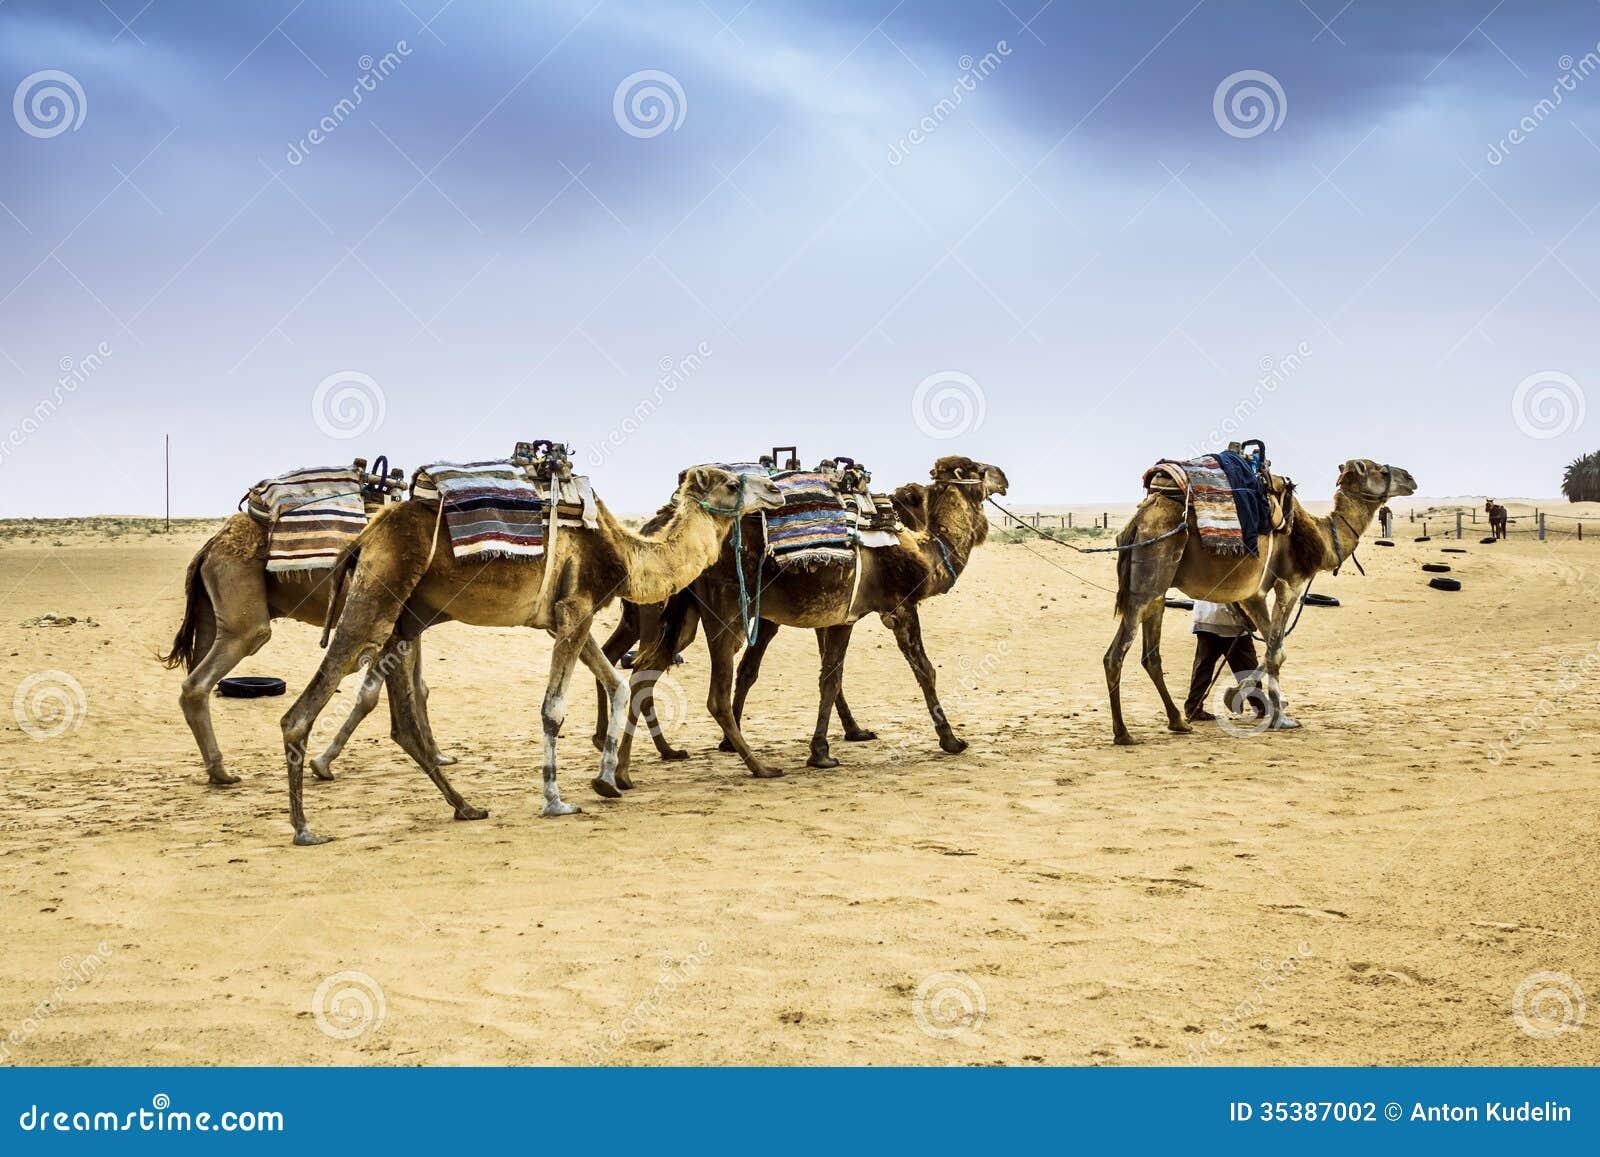 Camel Caravan | www.pixshark.com - Images Galleries With A ...